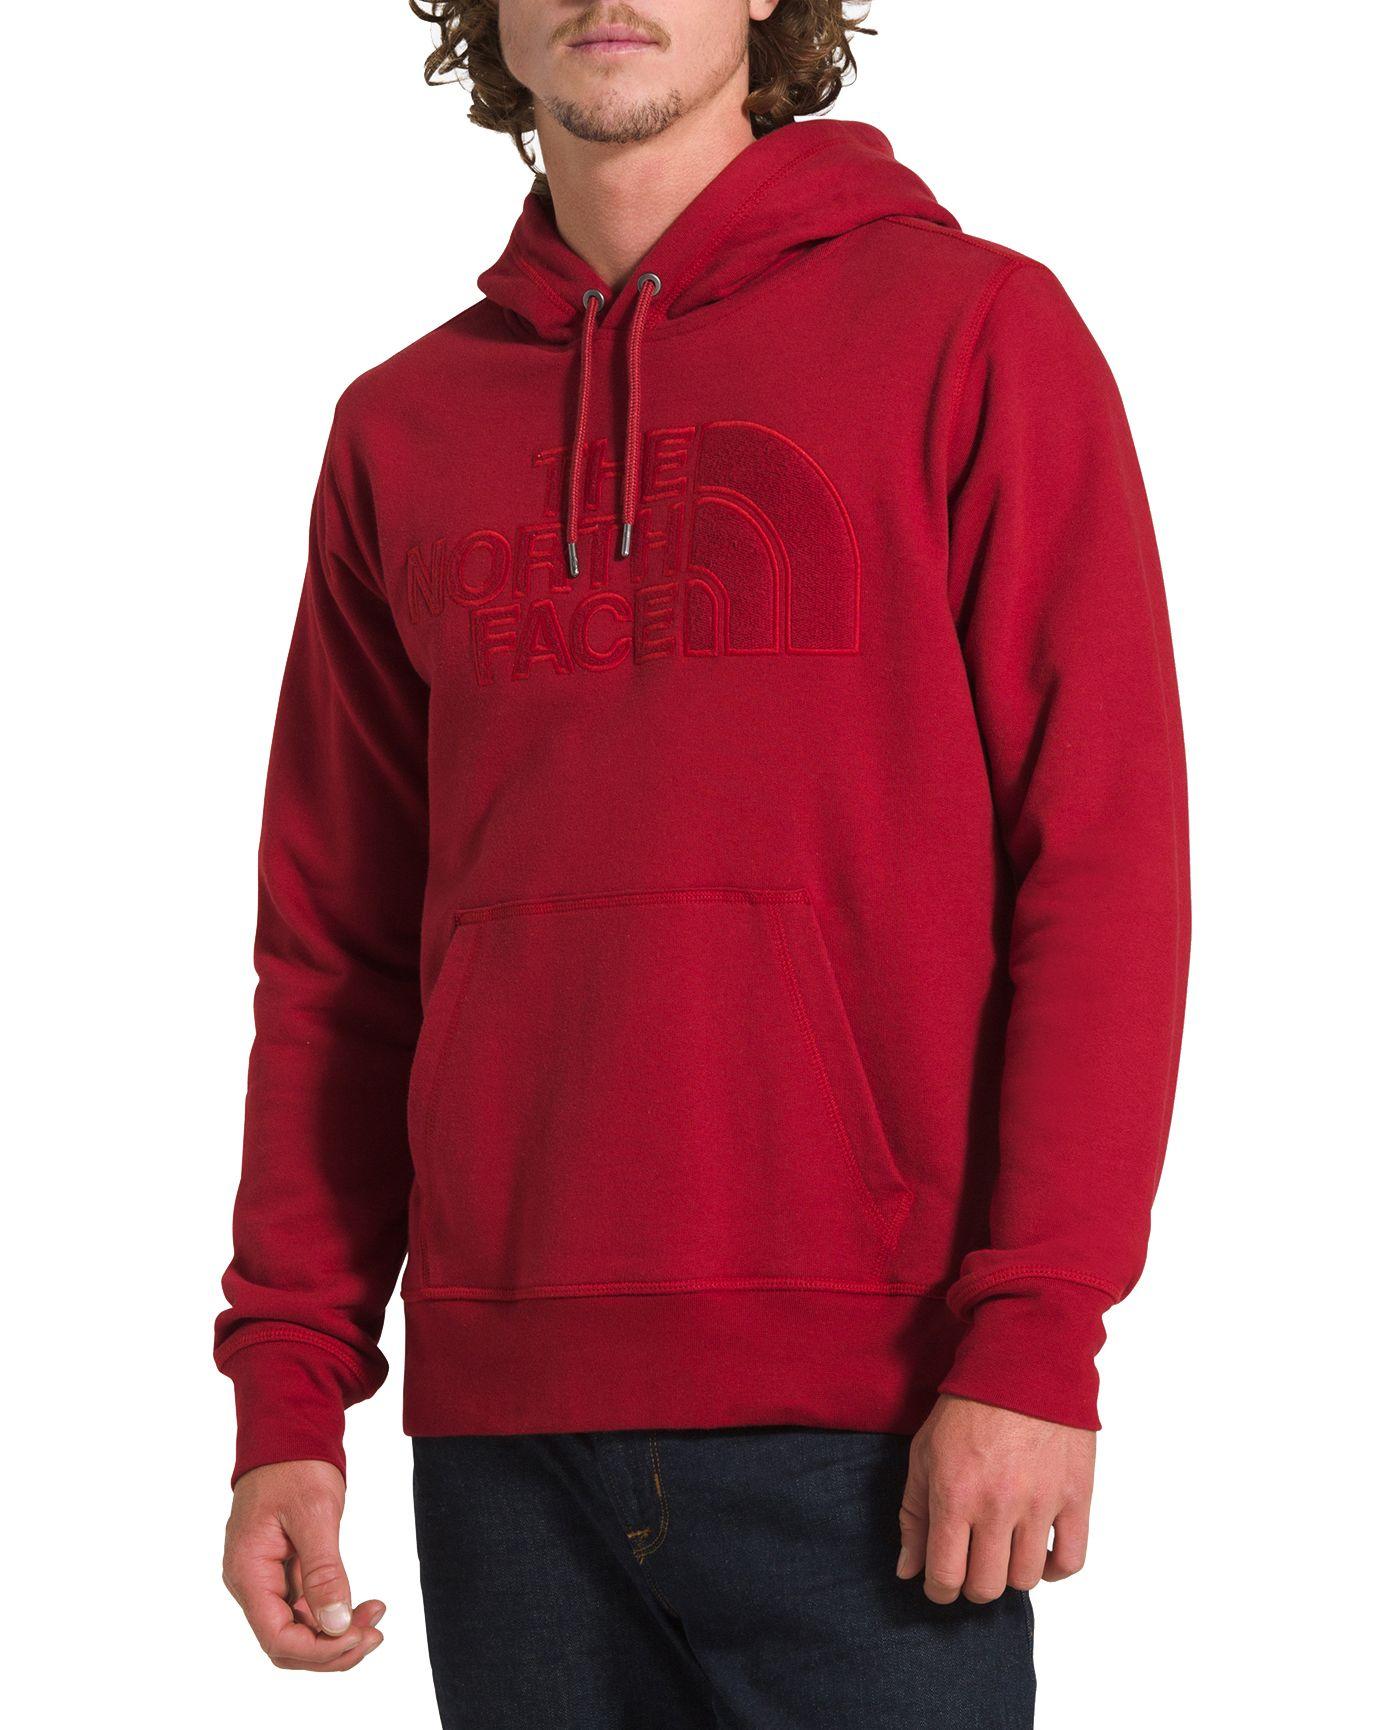 The North Face Men's Sobranta Pullover Hoodie